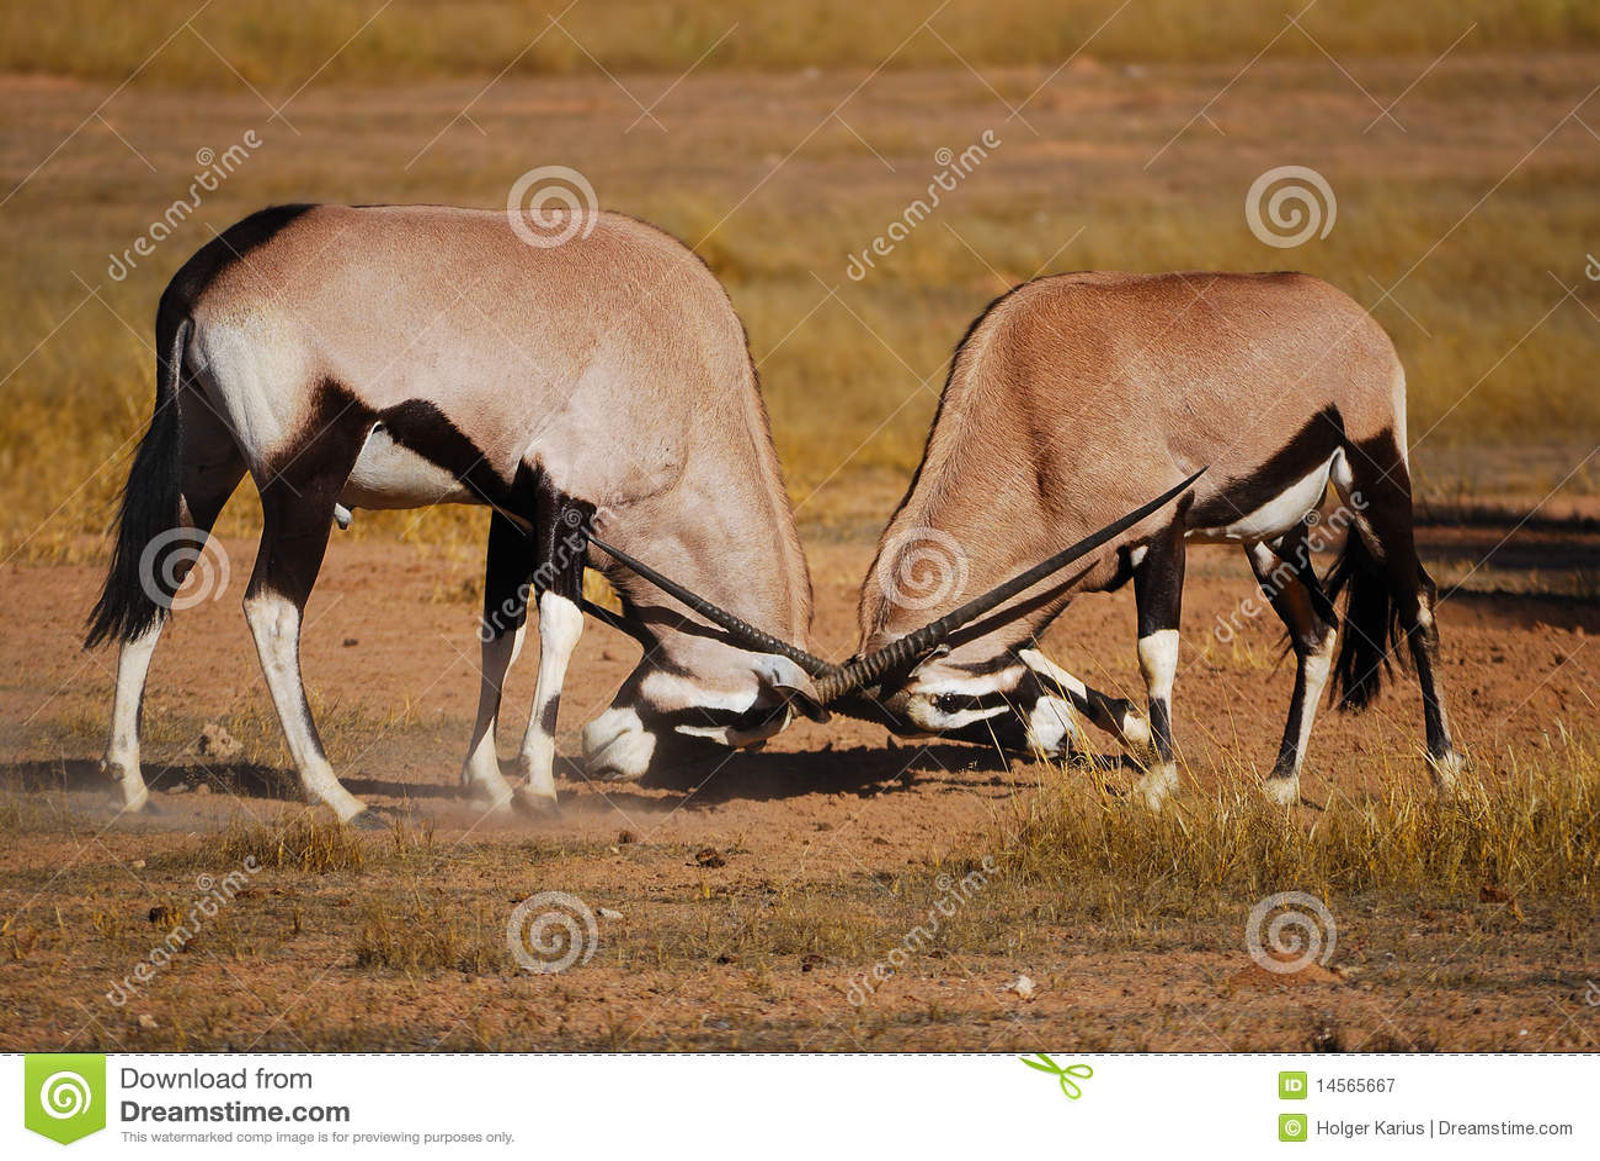 Fighting Gemsbok (Oryx Gazella) Royalty Free Stock ...